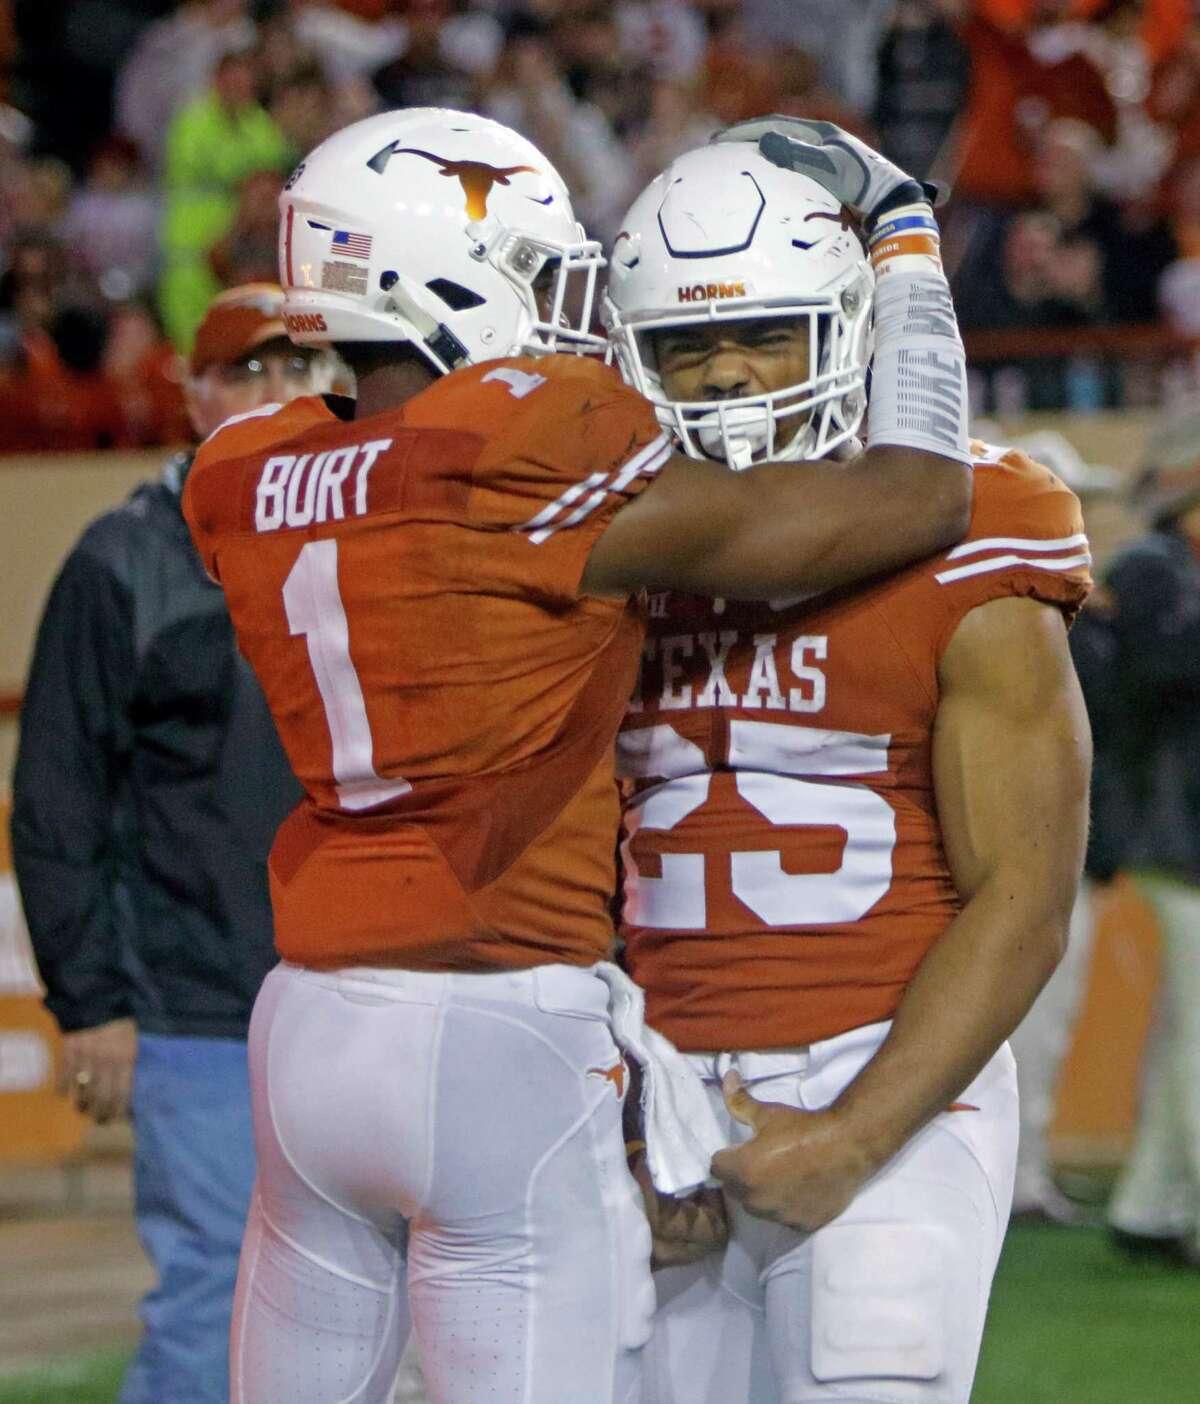 Texas' Chris Warren III (25) is congratulated by John Burt (1) after scoring a touchdown during the second half of an NCAA college football game against Texas Tech, Thursday, Nov. 26, 2015, in Austin, Texas. Texas Tech won 48-45. (AP Photo/Michael Thomas)